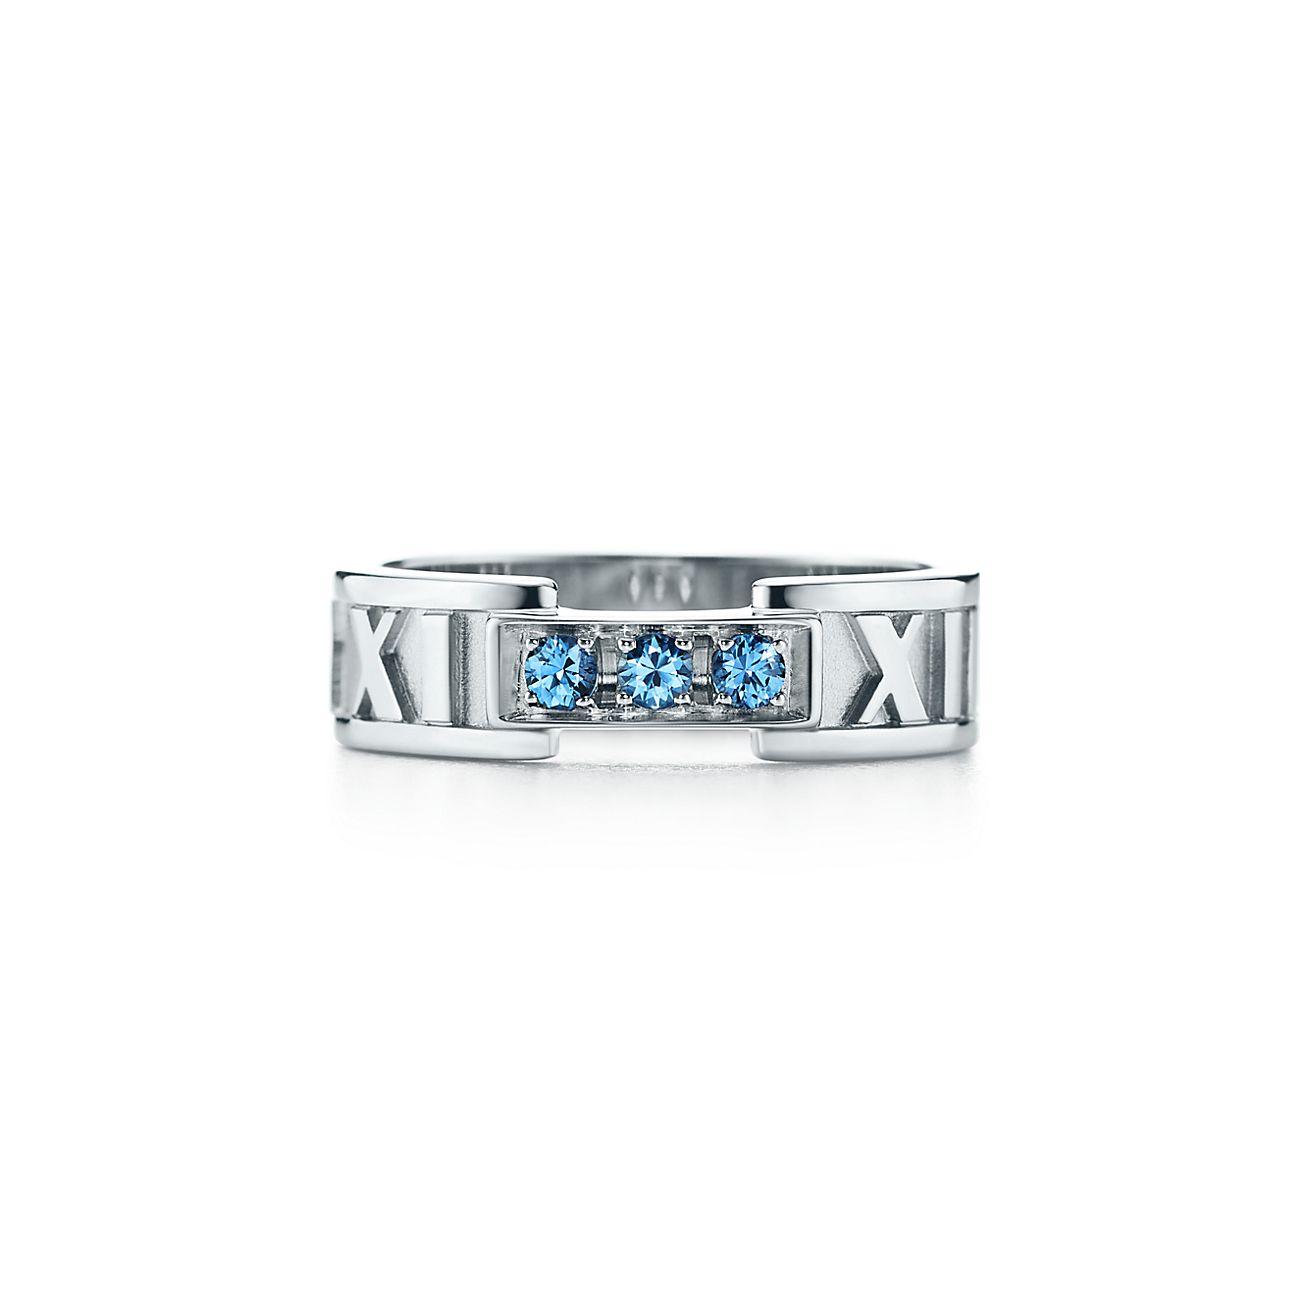 Atlas Fermé Anneau Étroit En Or Blanc 18 Carats Avec Saphirs Montana - Taille 5 1/2 Tiffany & Co. XyY8Z